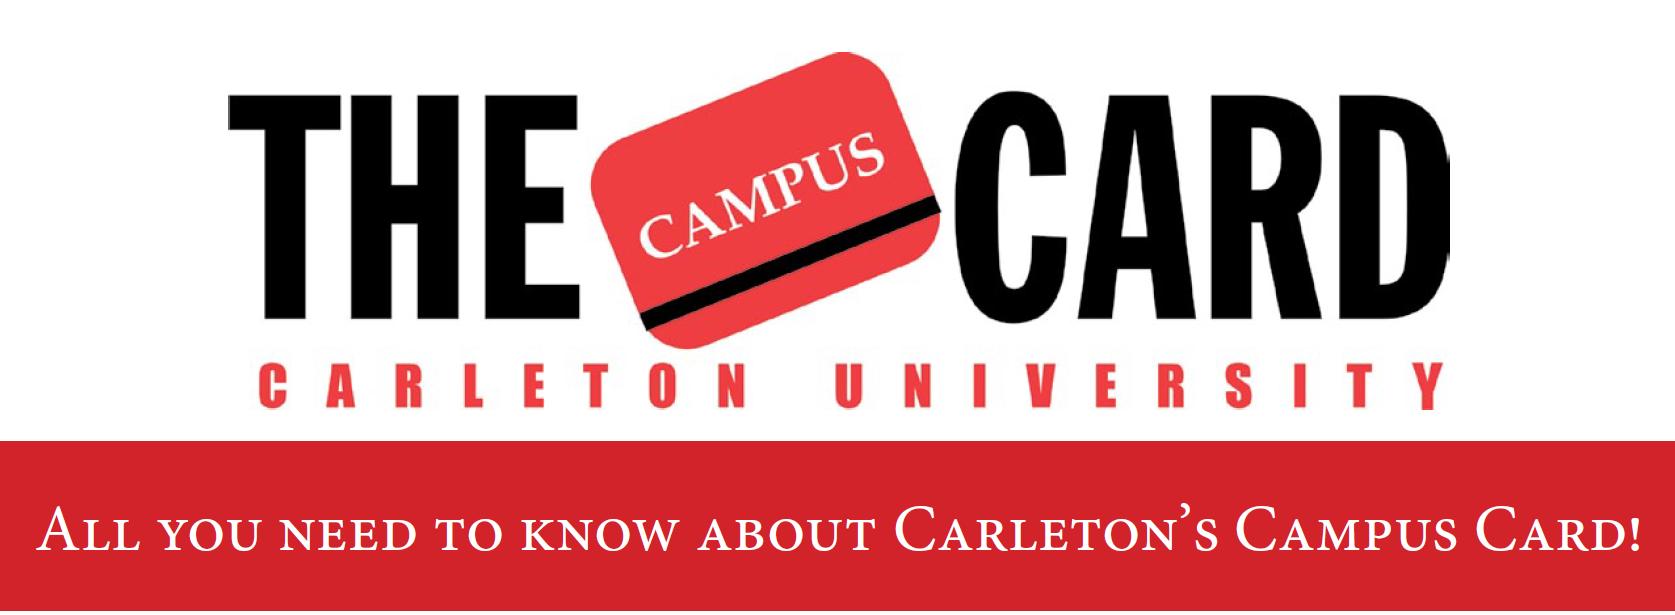 carleton card e card: